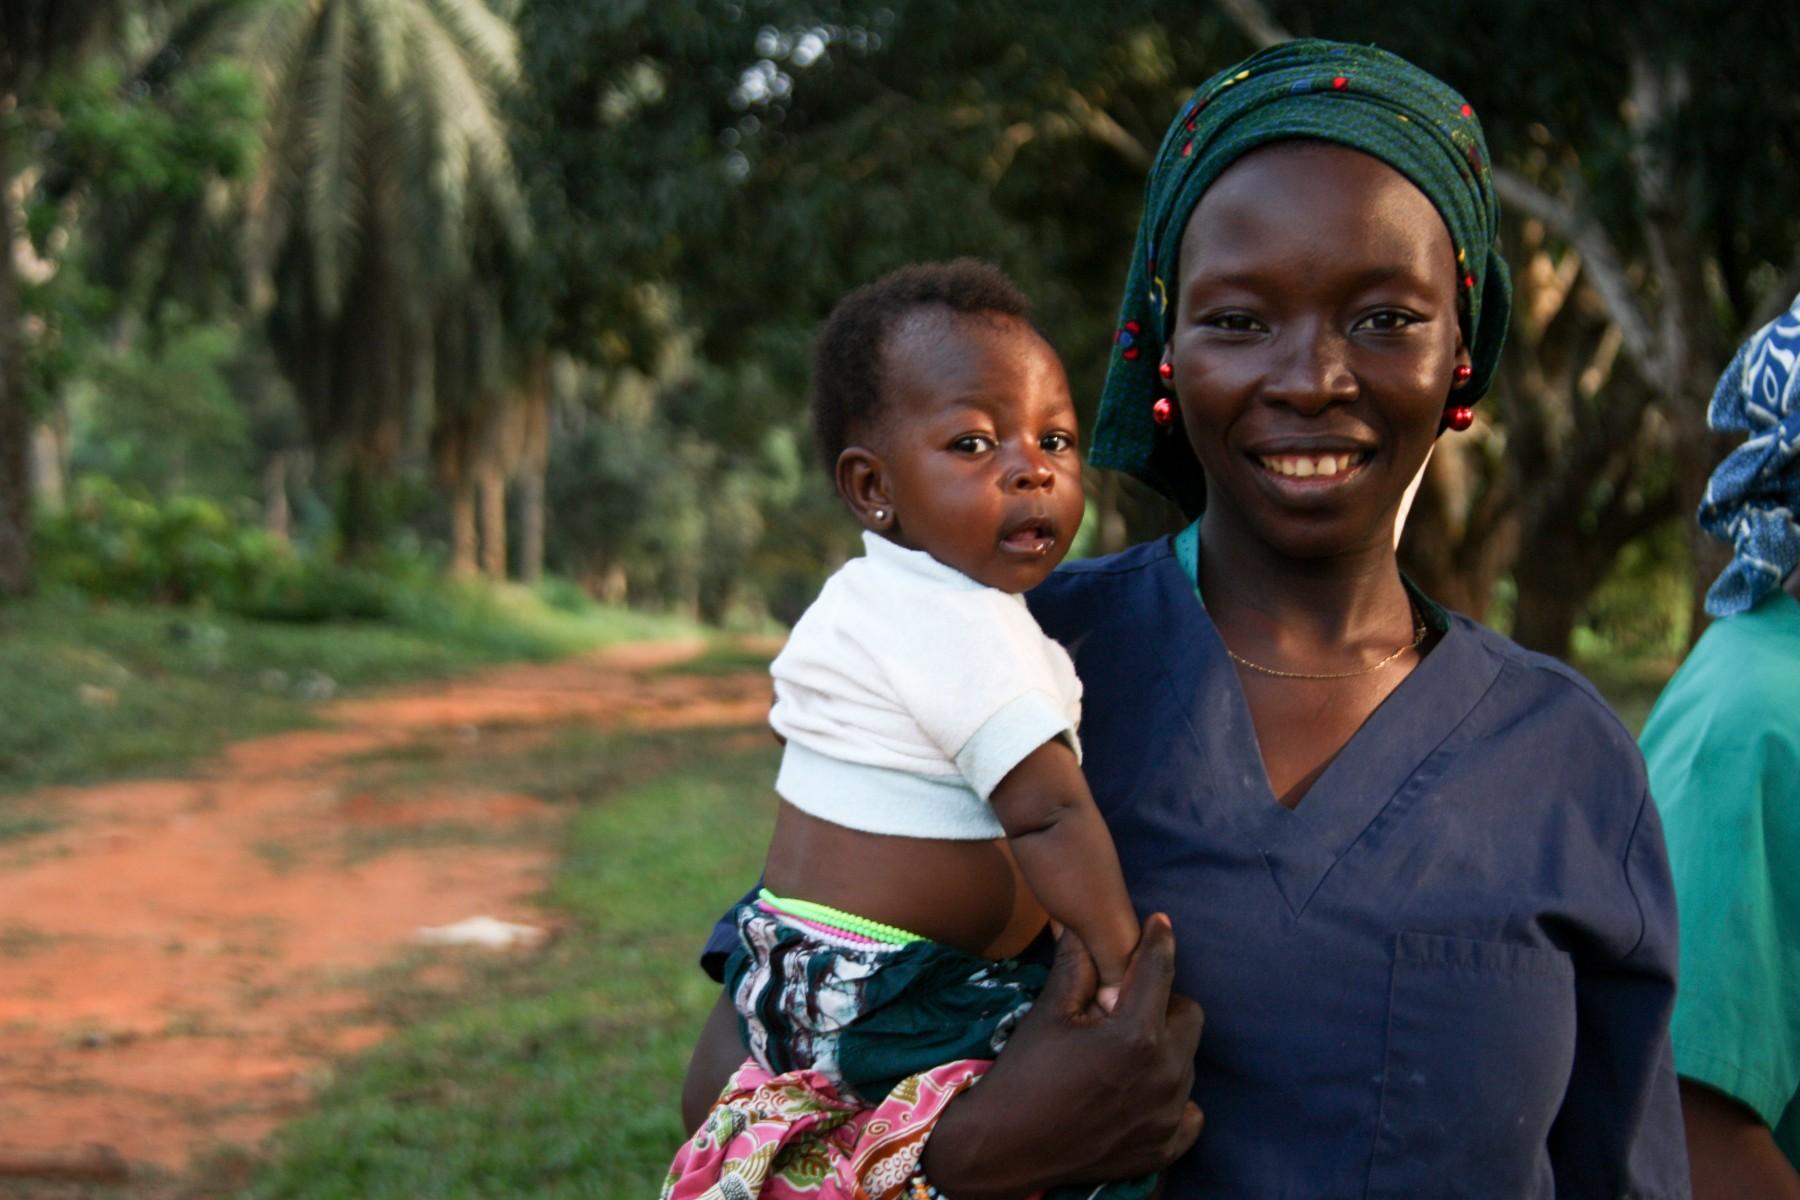 refugiada de boko haram